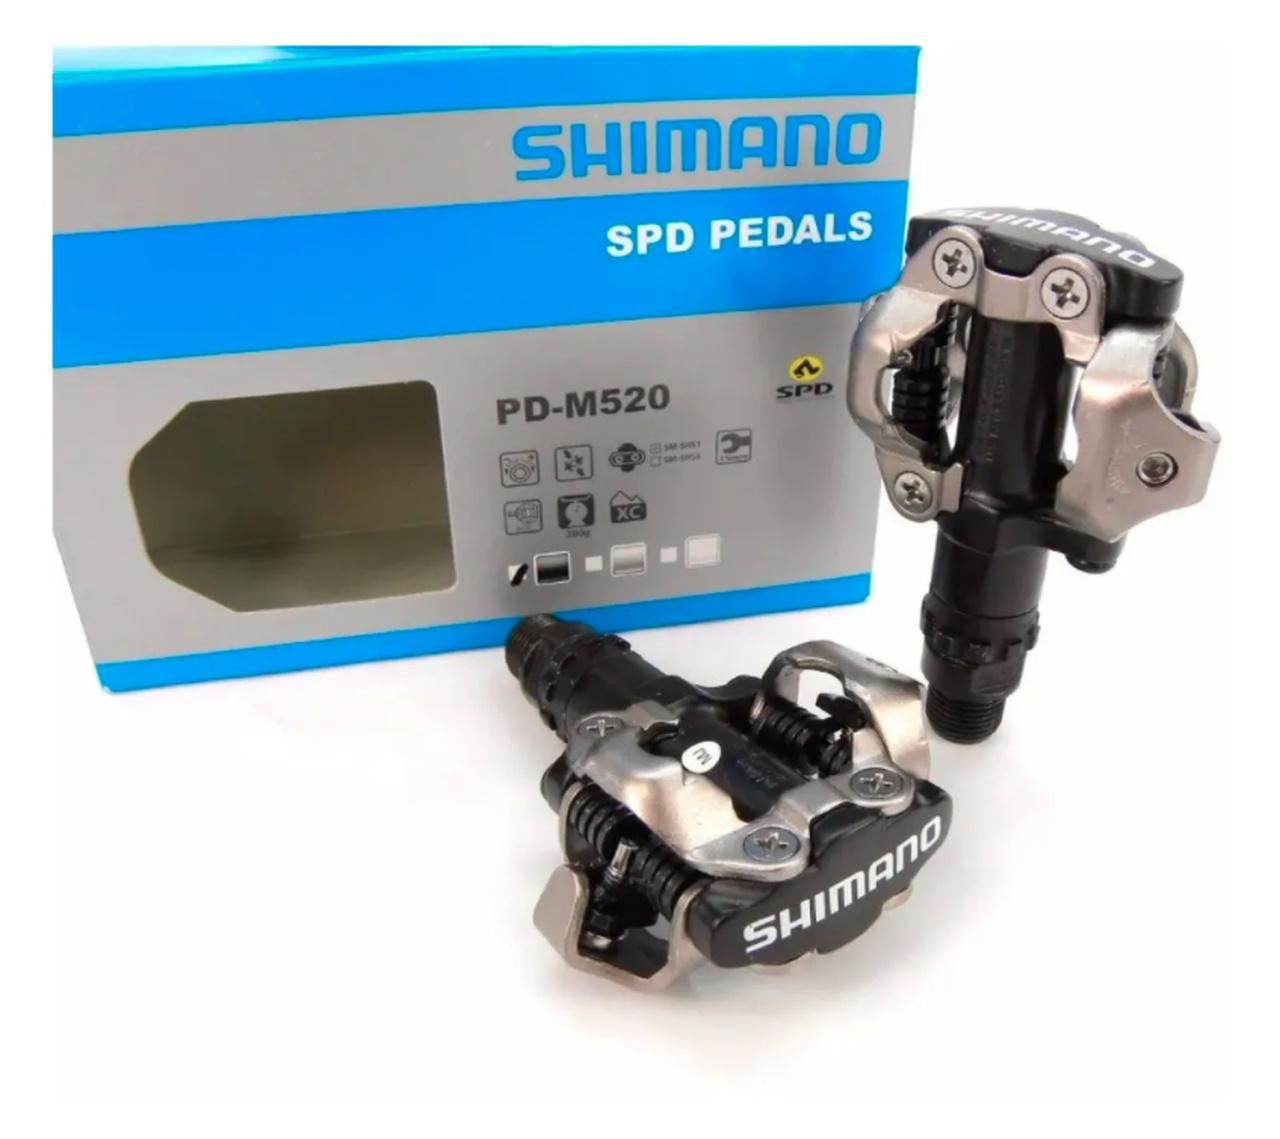 PEDAL MTB SHIMANO PD-M520 PTO (1190010)